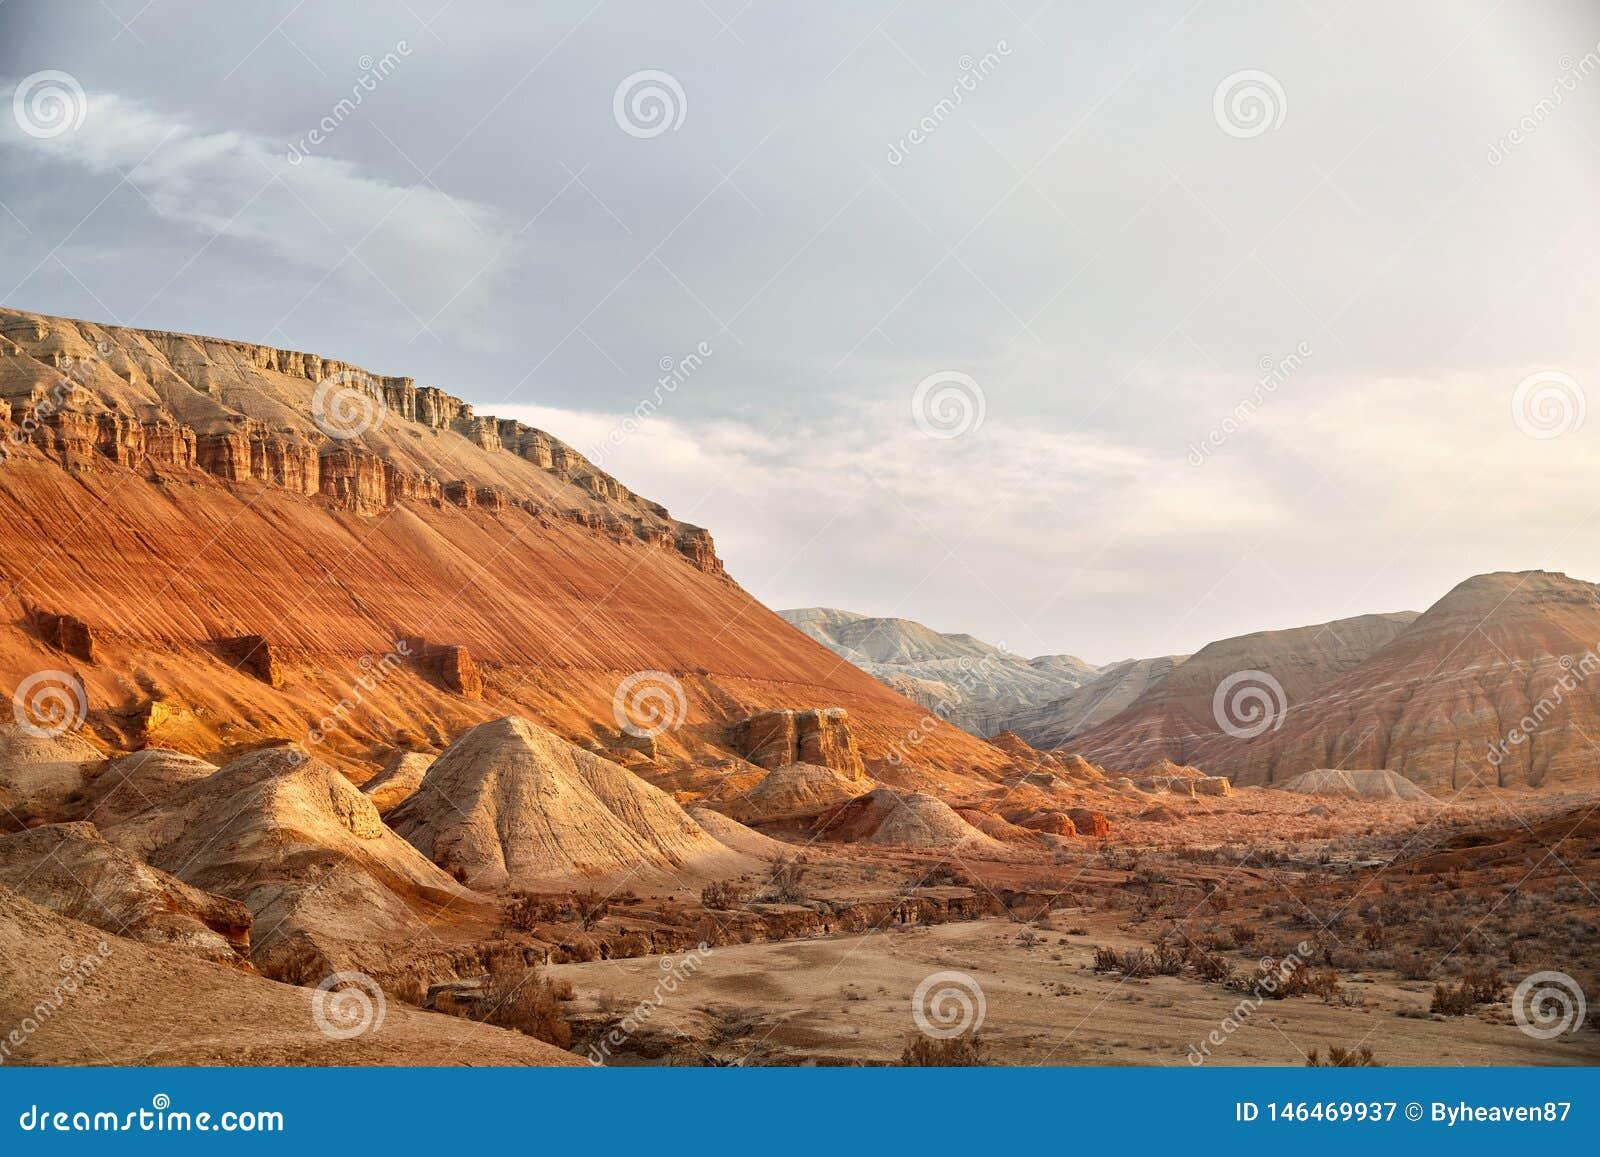 Гранд-каньон в пустыне